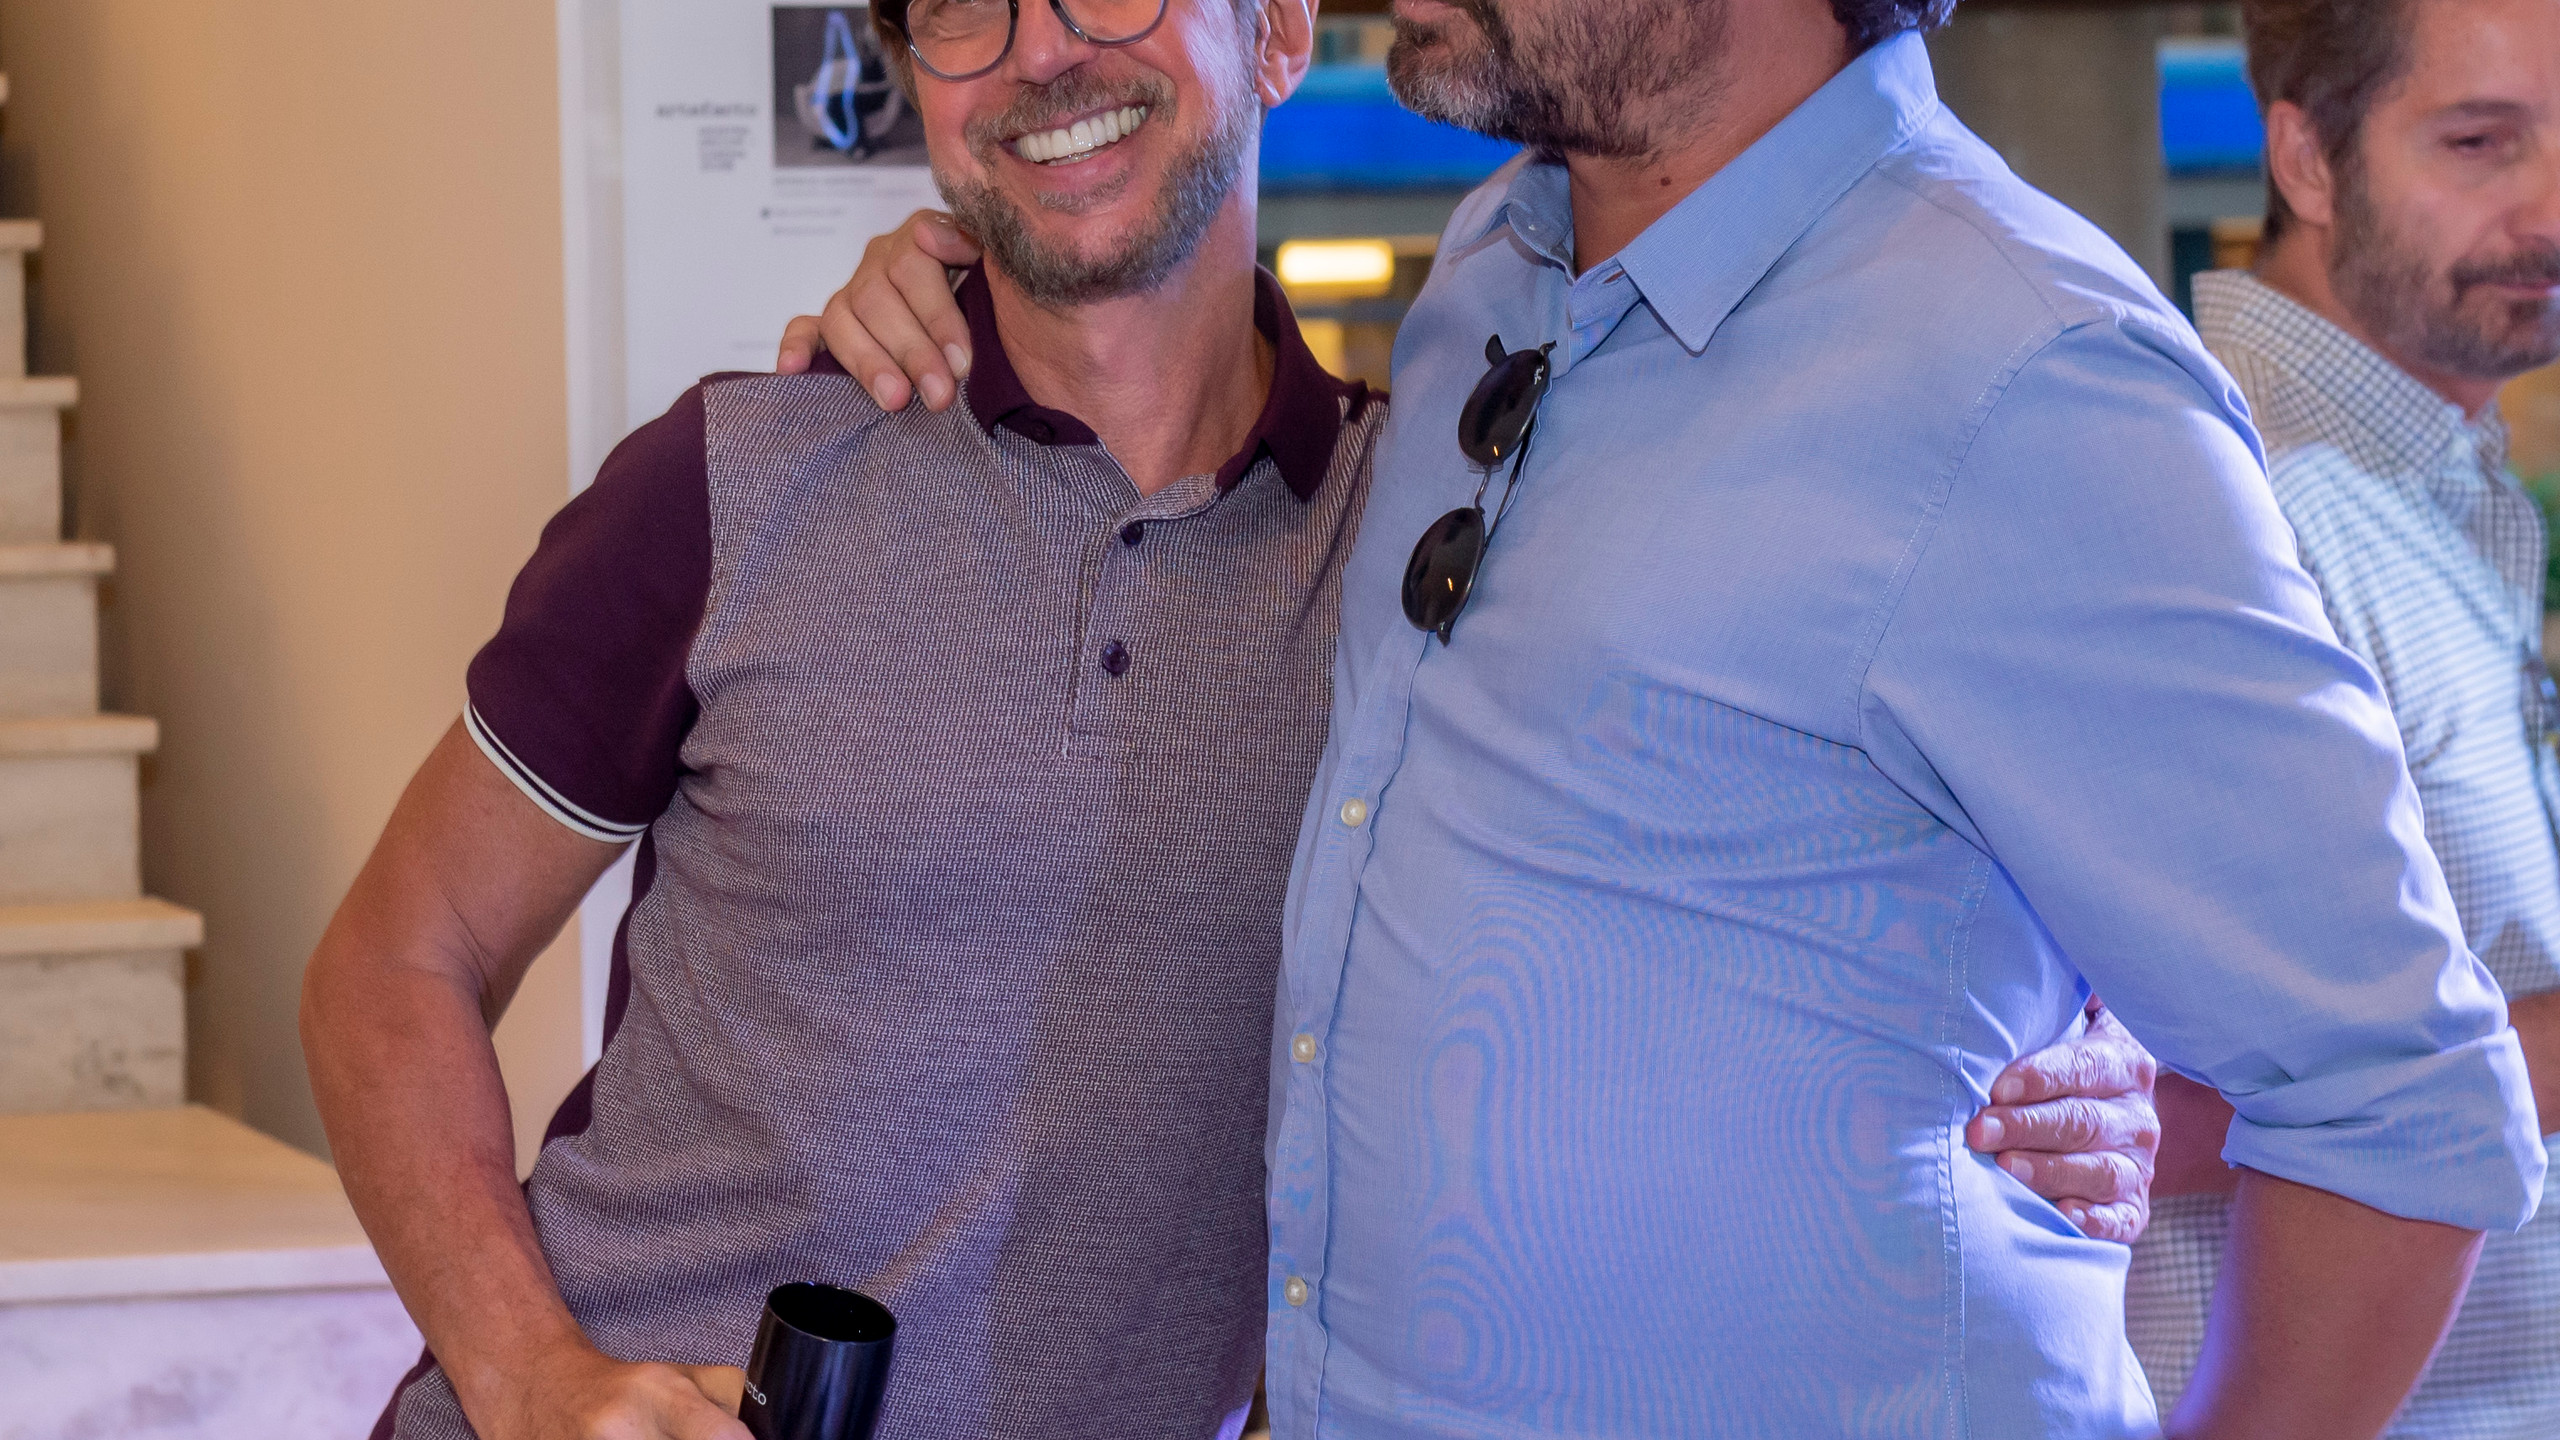 Nando Grabowsky e Miguel Pinto Guimaraes